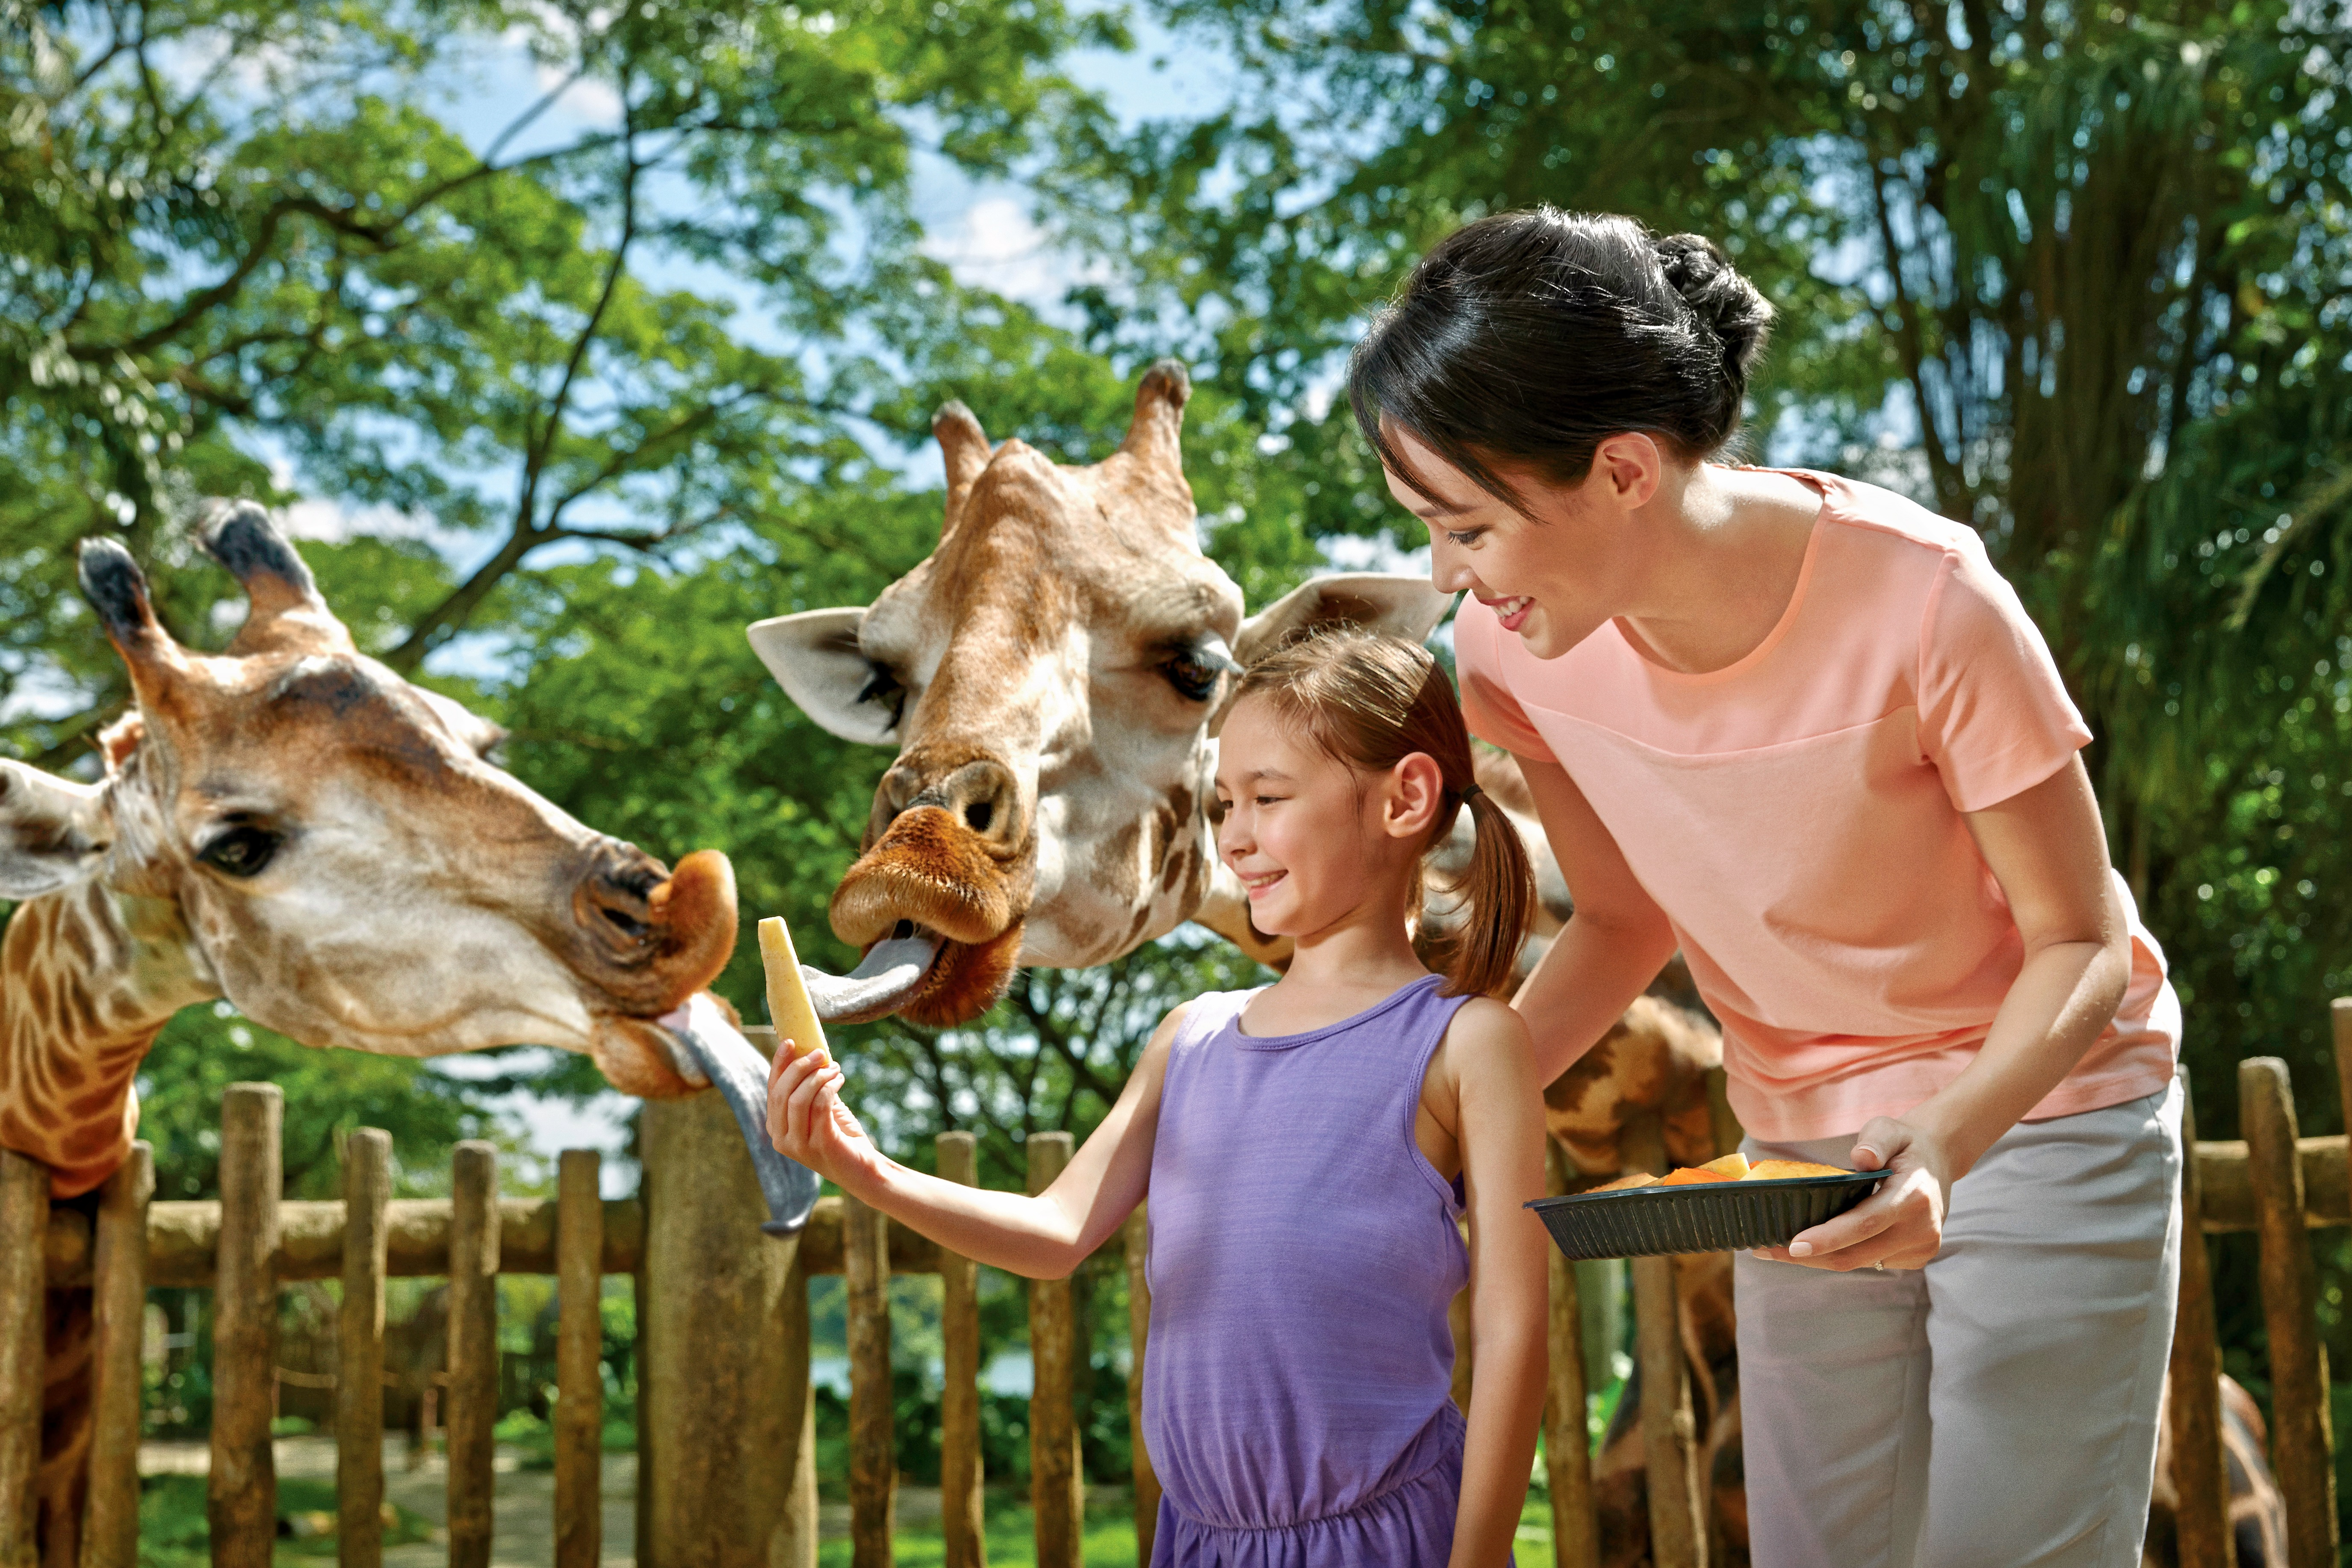 Zoo_giraffefeeding_477_main_v2_03.jpg